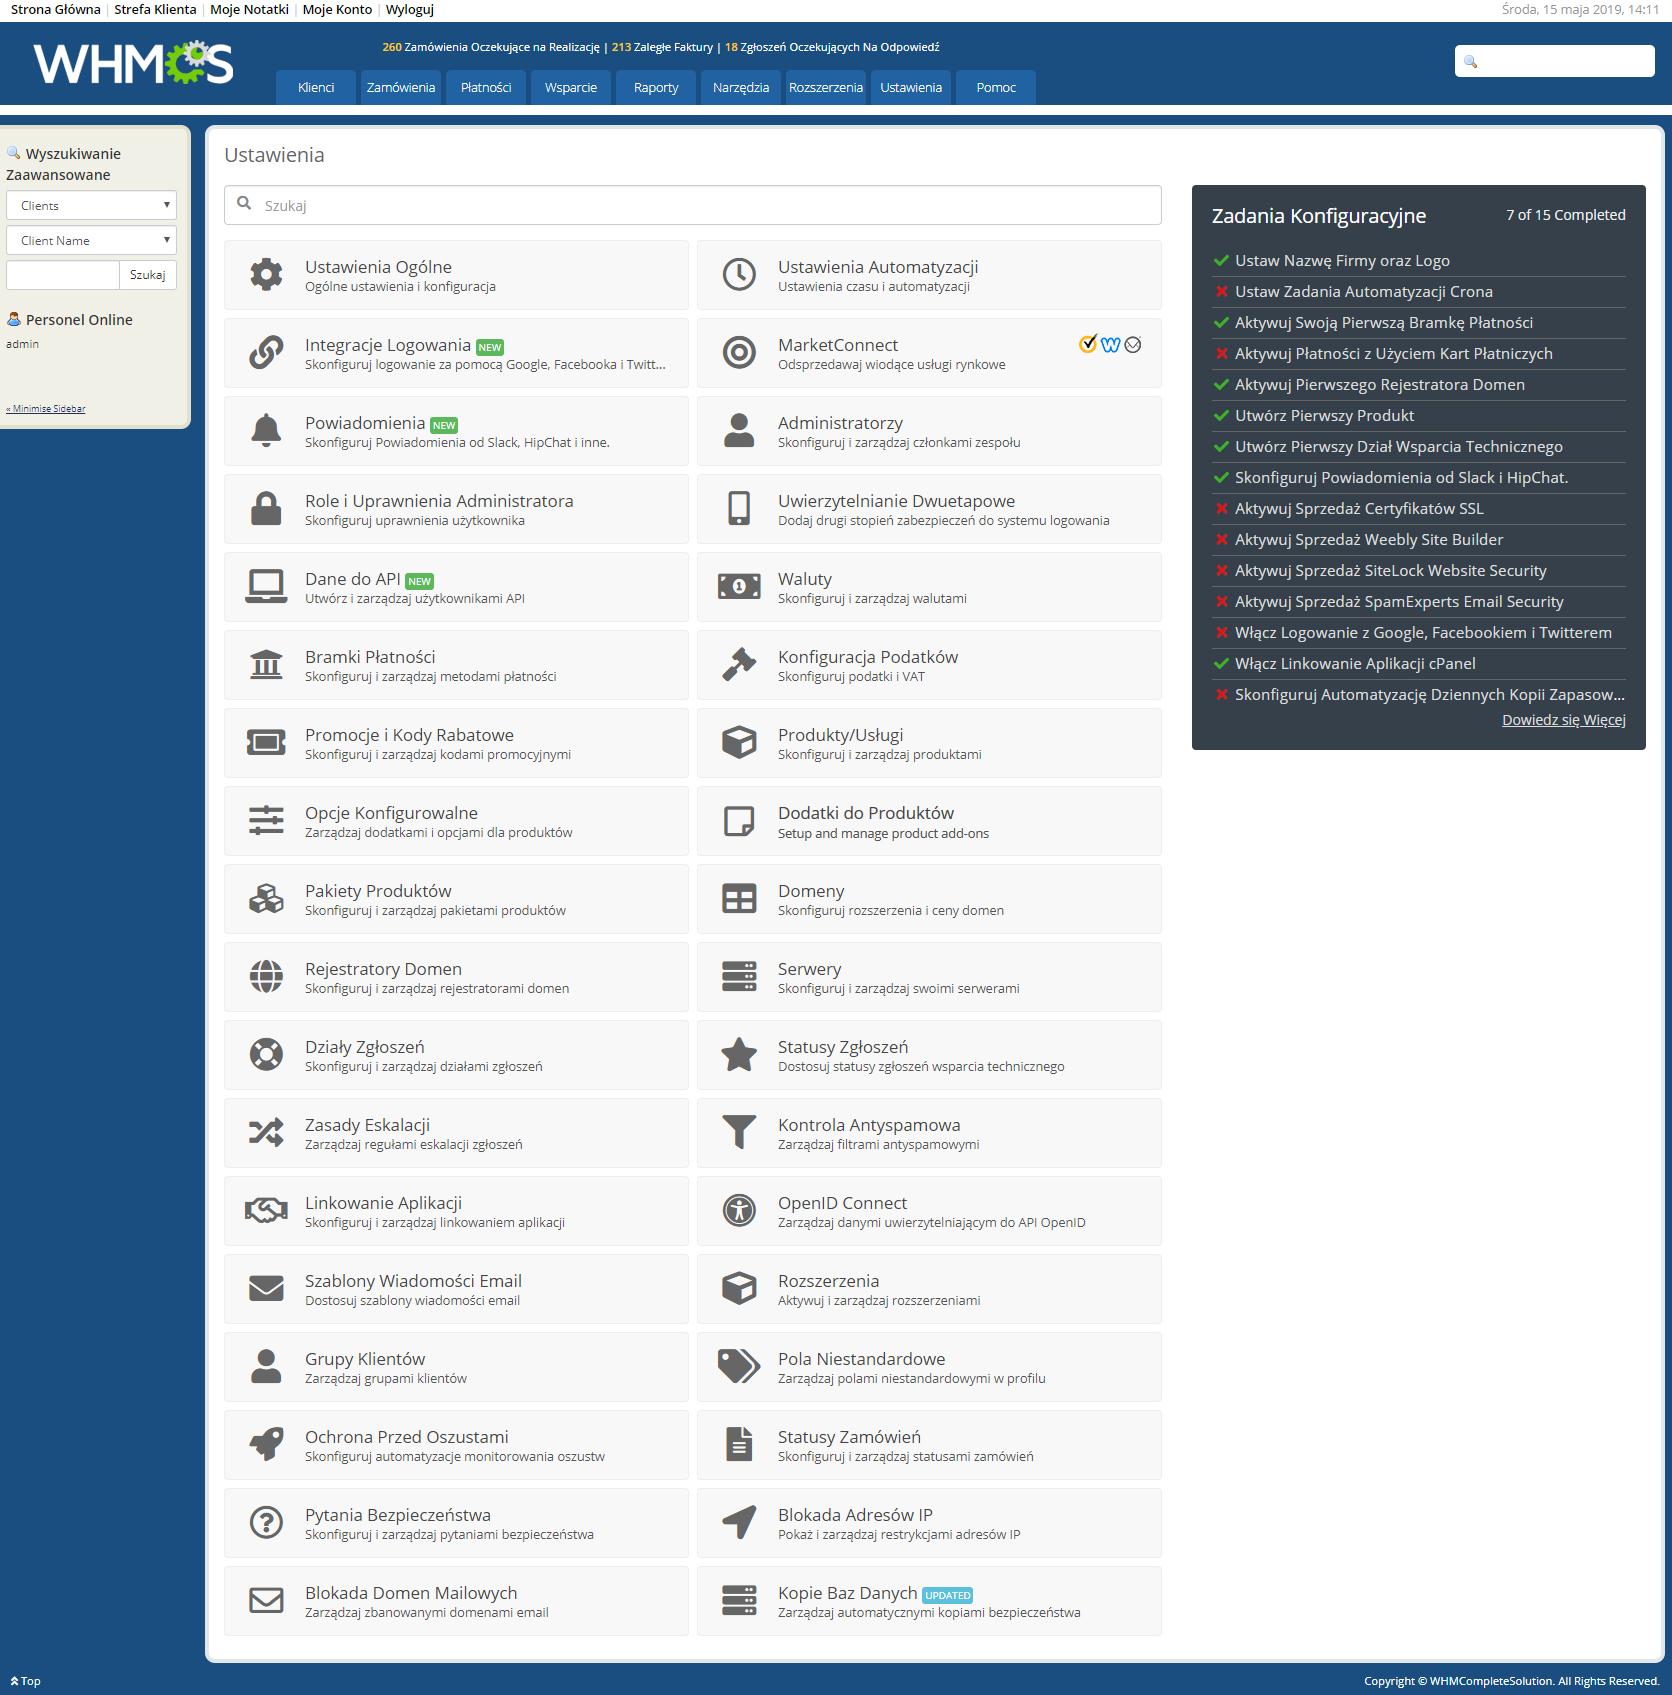 Polish Language Translation For WHMCS: Module Screenshot 26